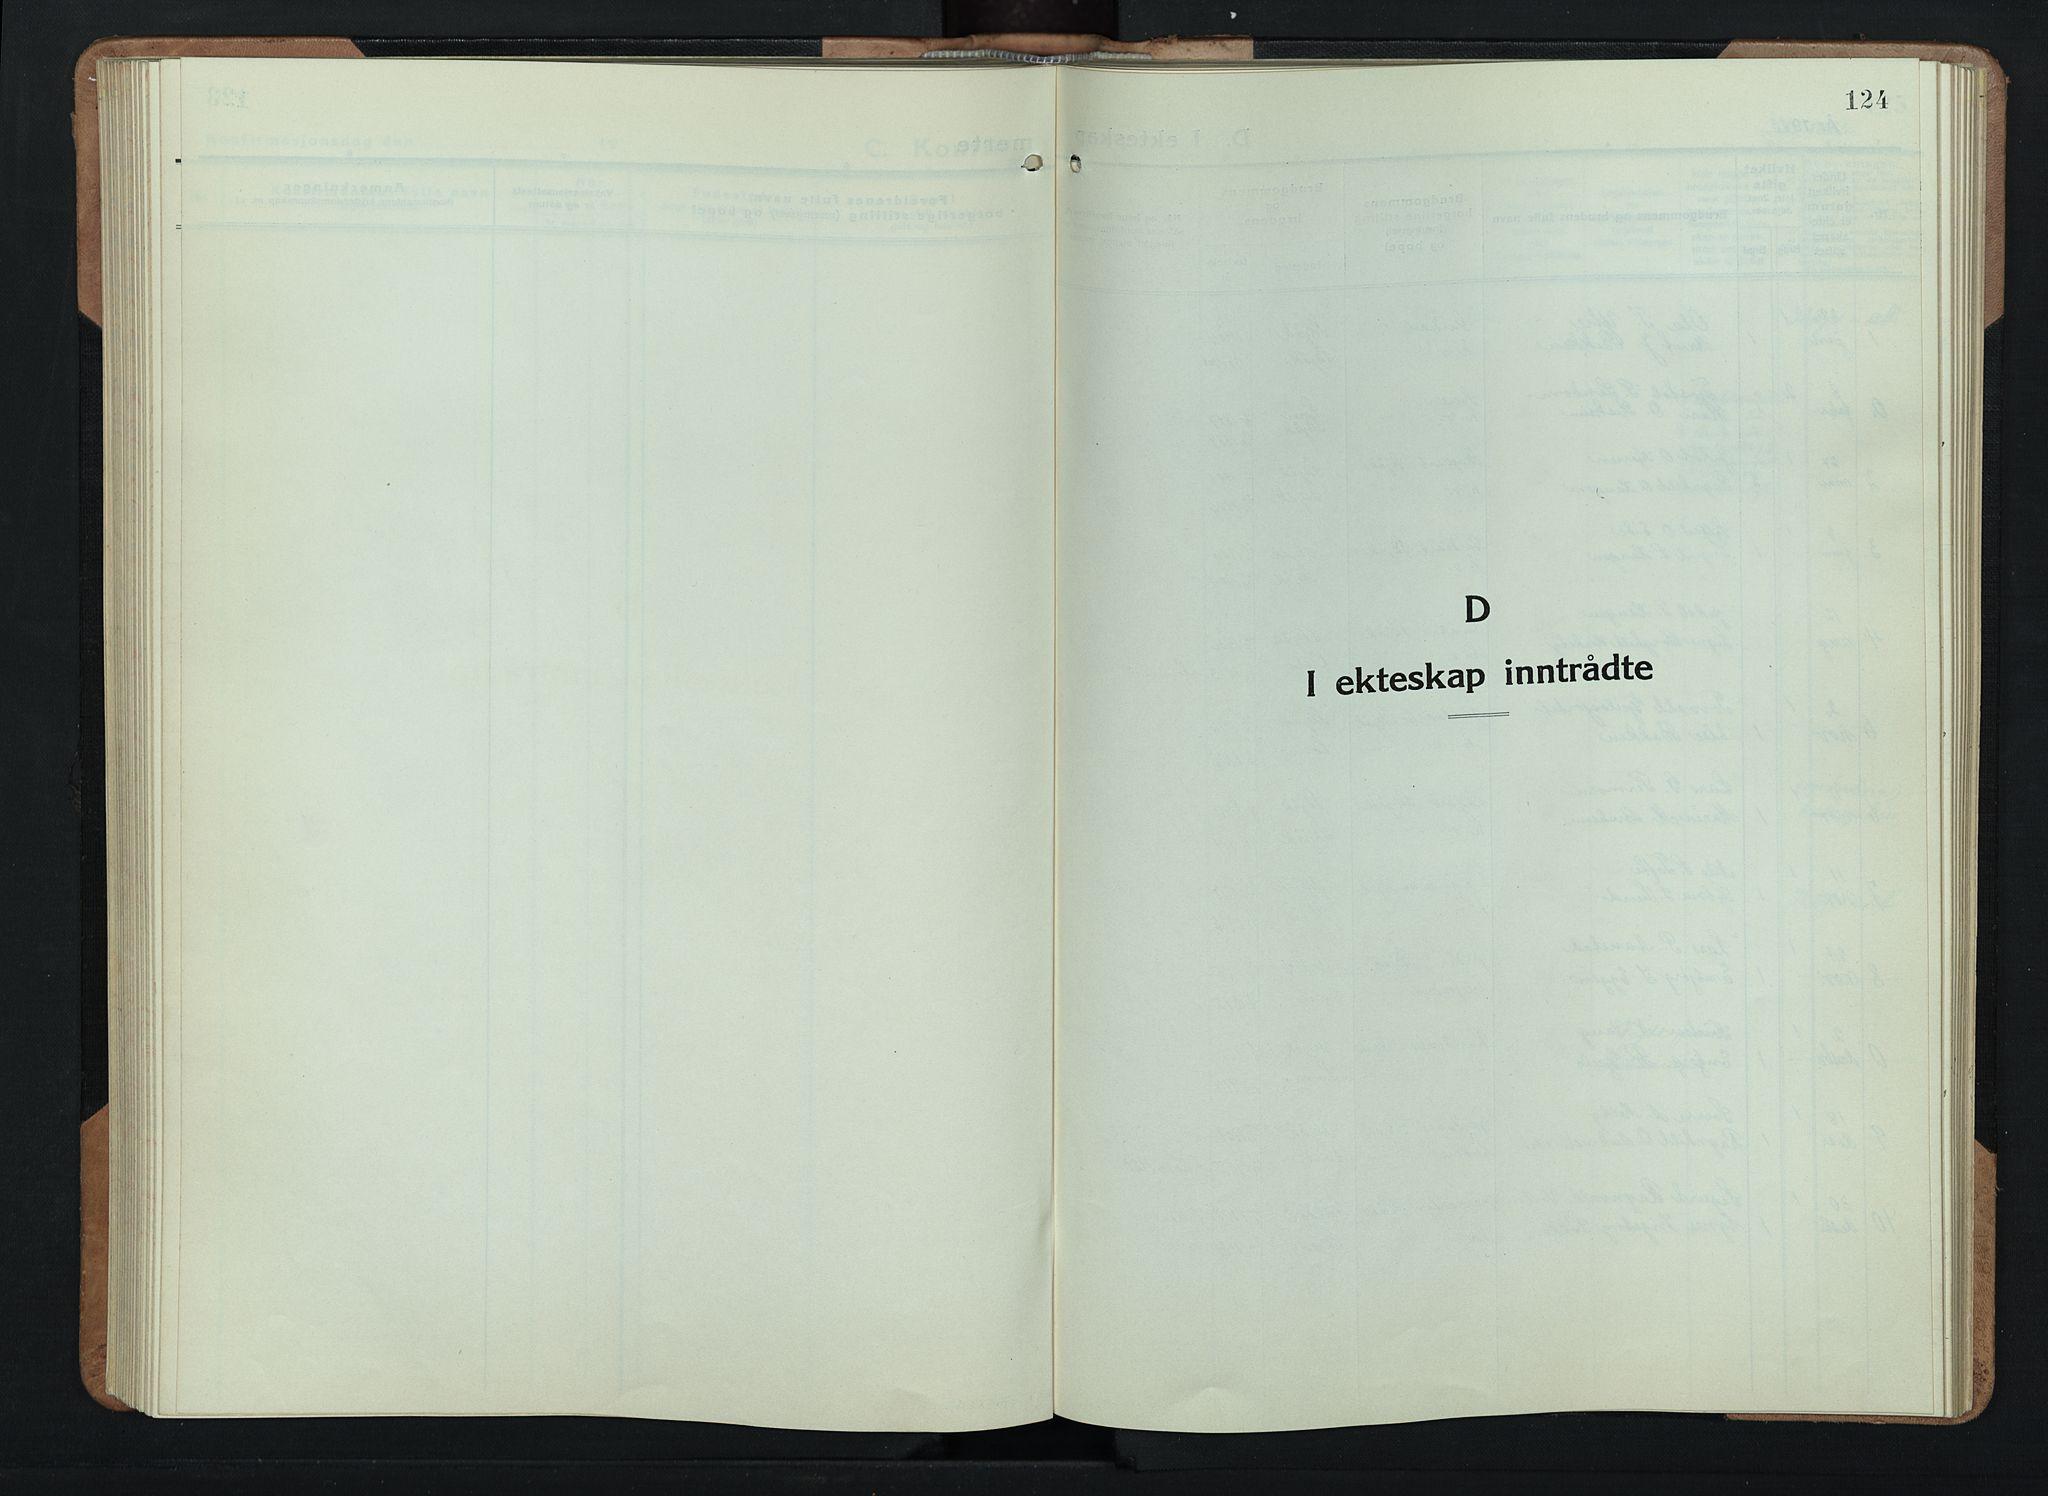 SAH, Skjåk prestekontor, Klokkerbok nr. 6, 1933-1954, s. 124